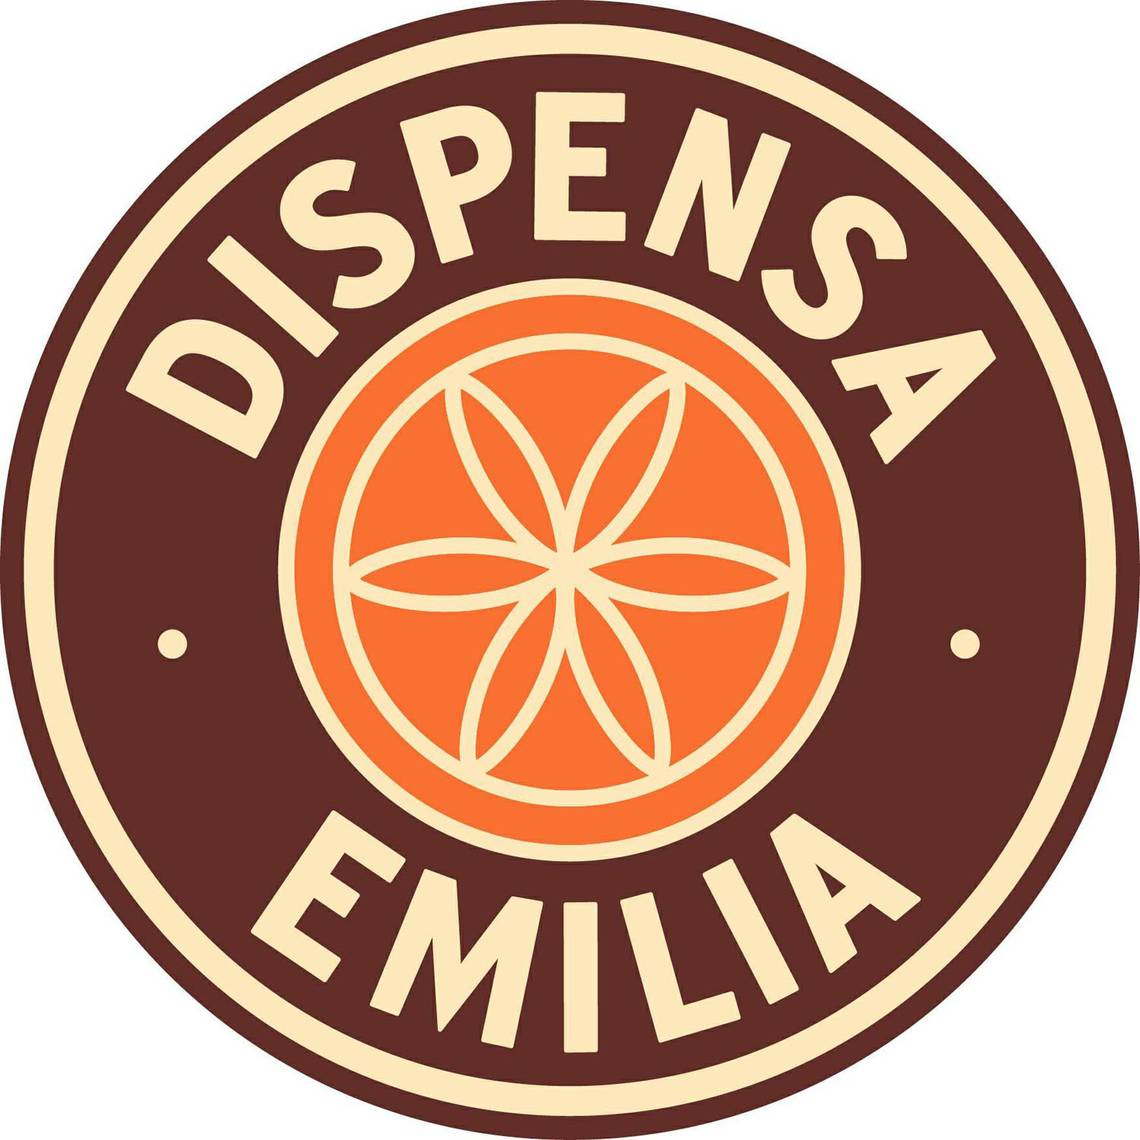 Dispensa Emilia .jpg